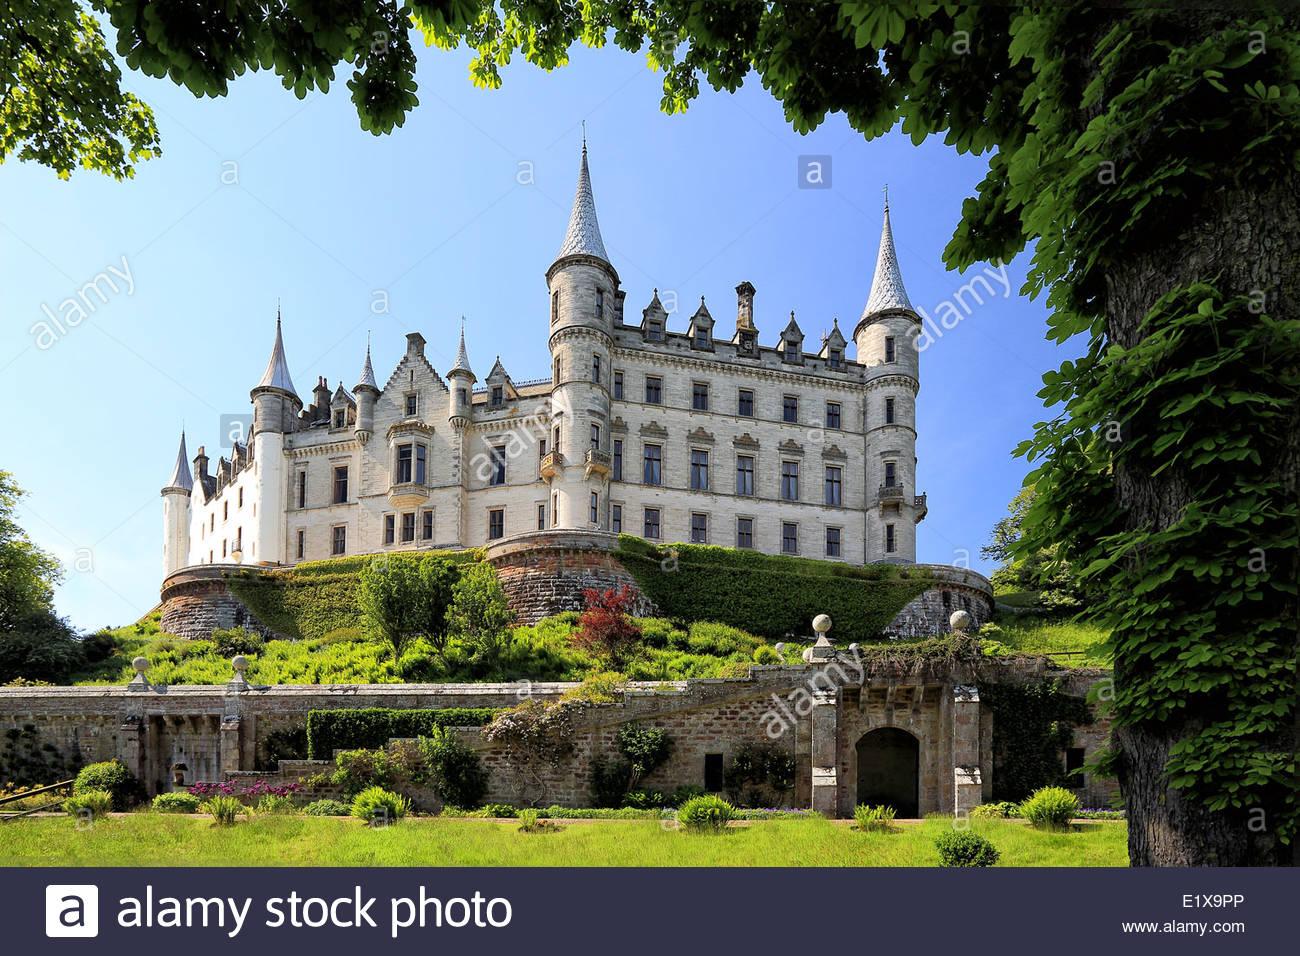 Dunrobin Castle and garden - Stock Image